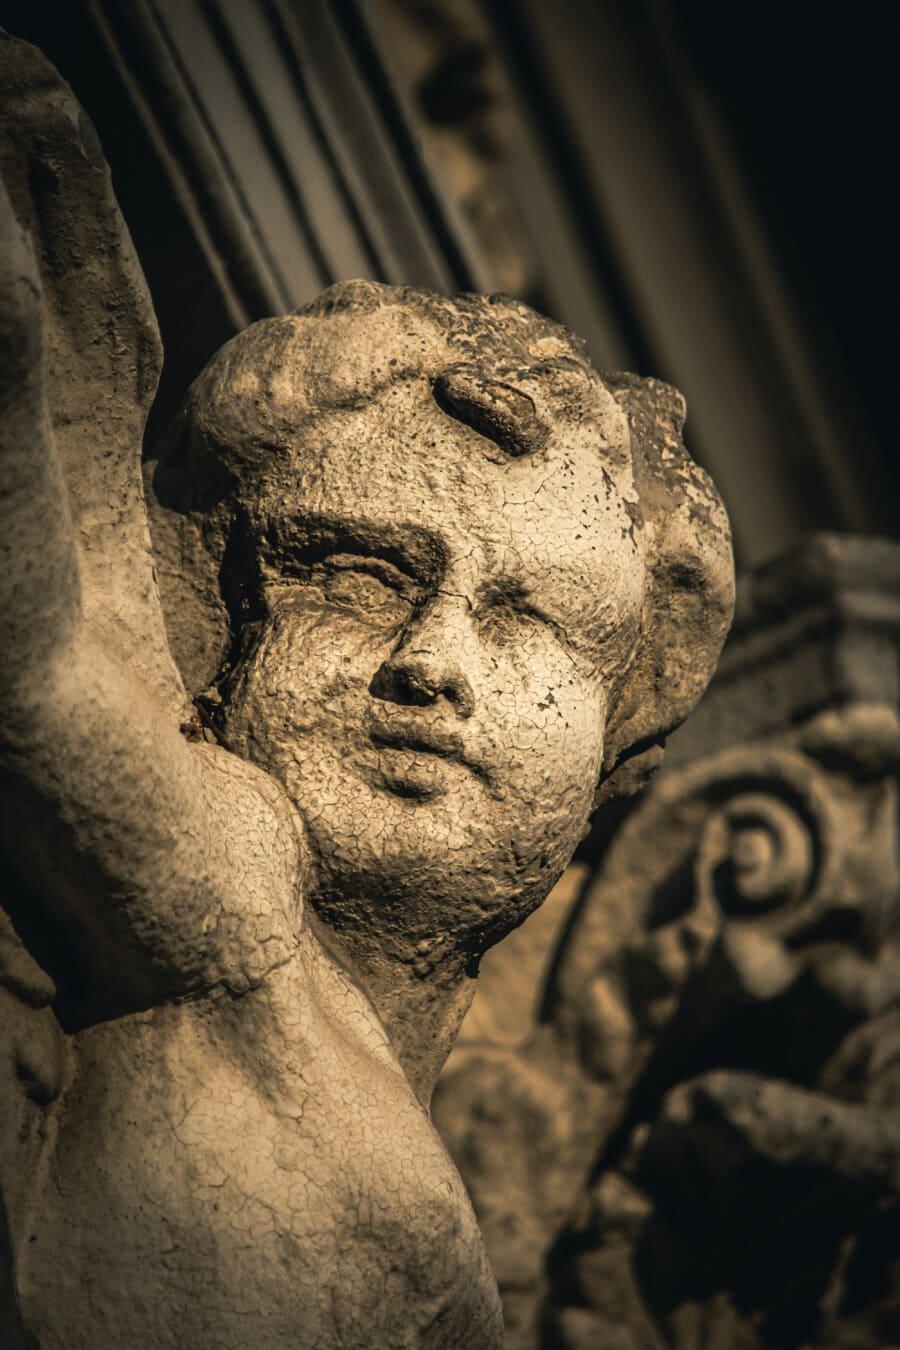 angel, sculpture, child, face, decay, old, stone, art, portrait, statue